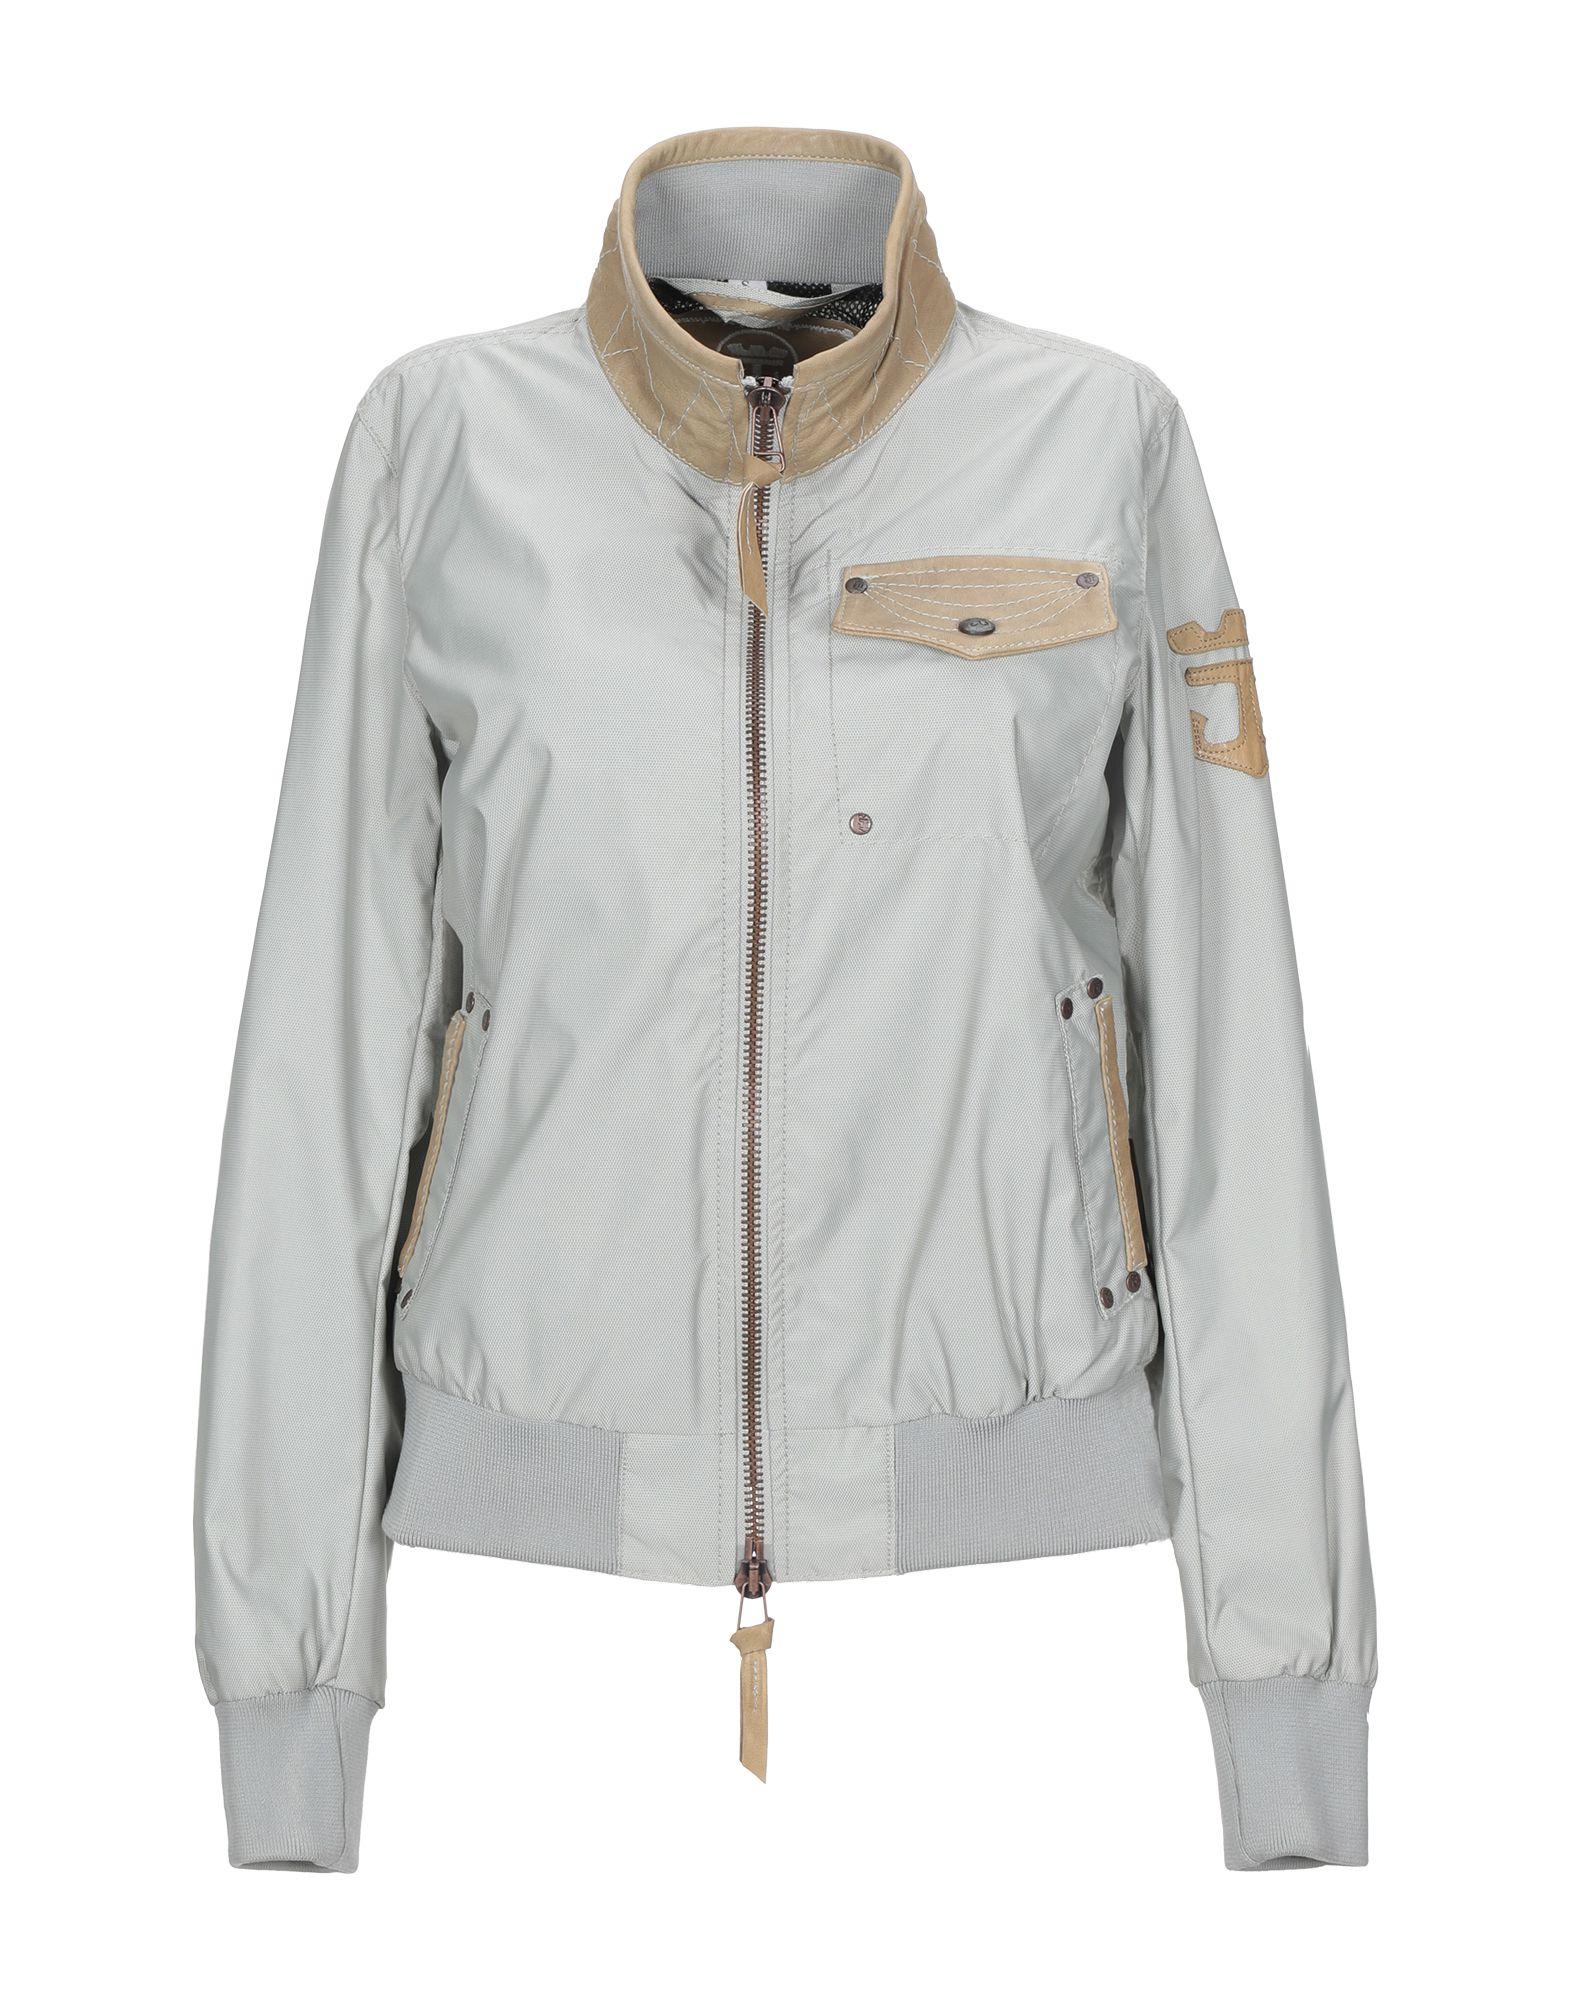 SAMPO M/sh ICEBREAKER Куртка цена